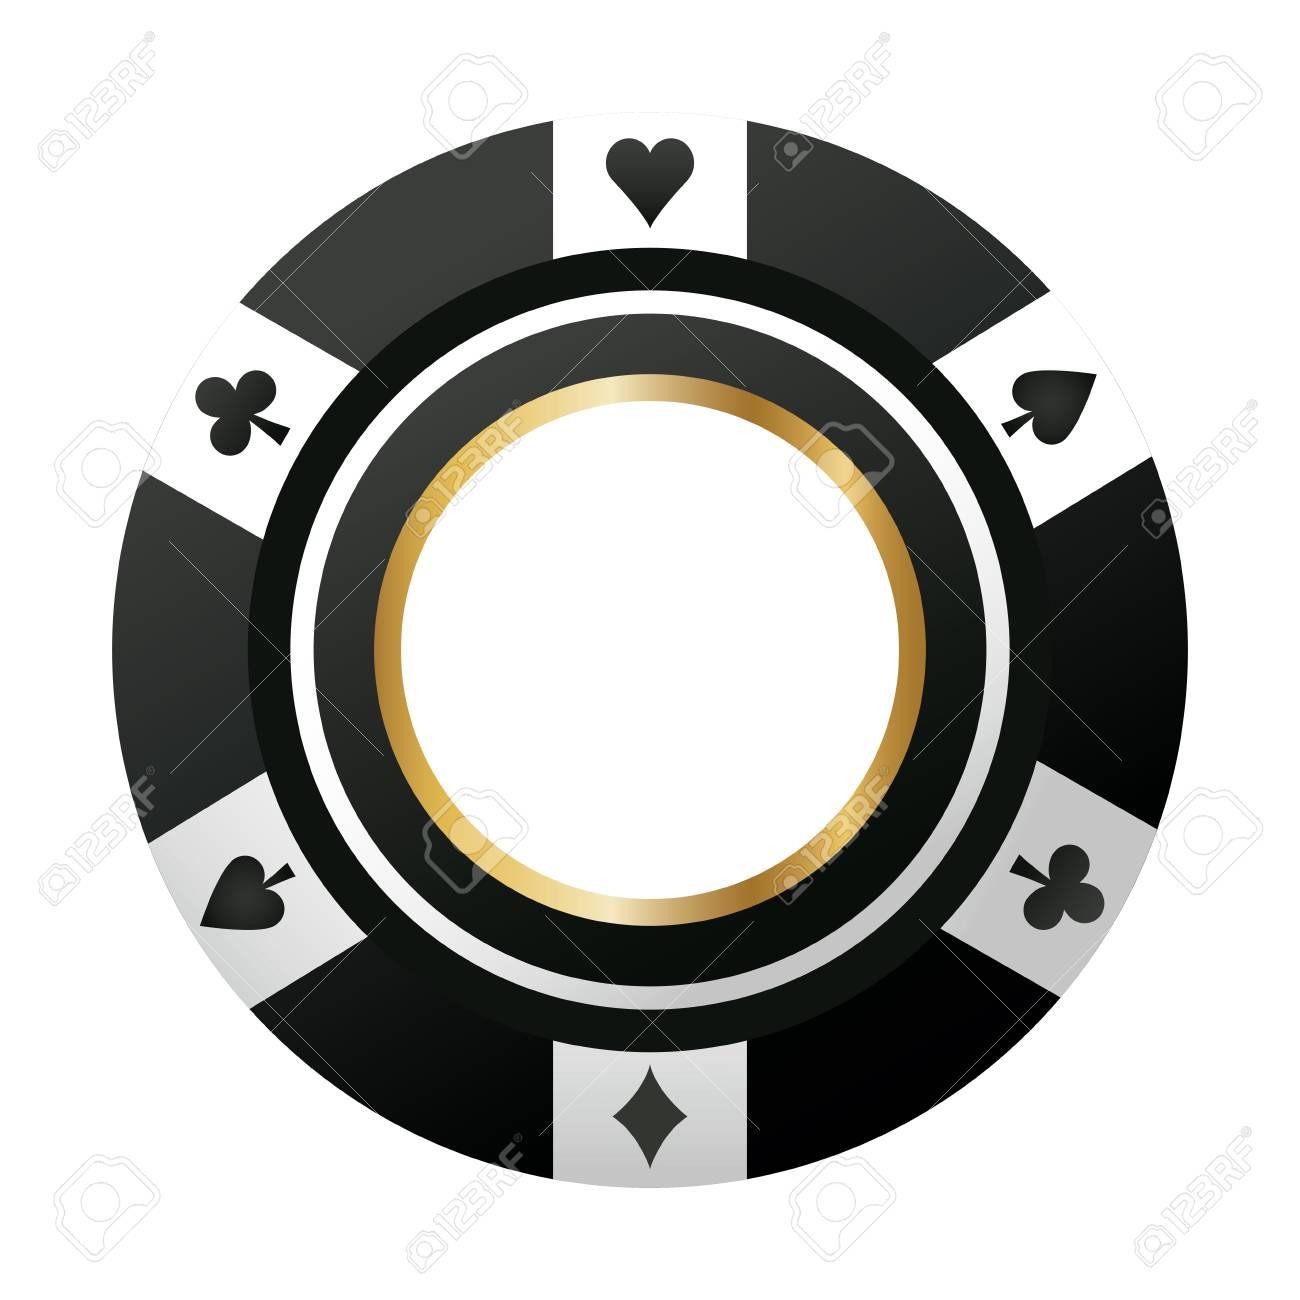 poker chip casino game black icon vector illustration - 80283548